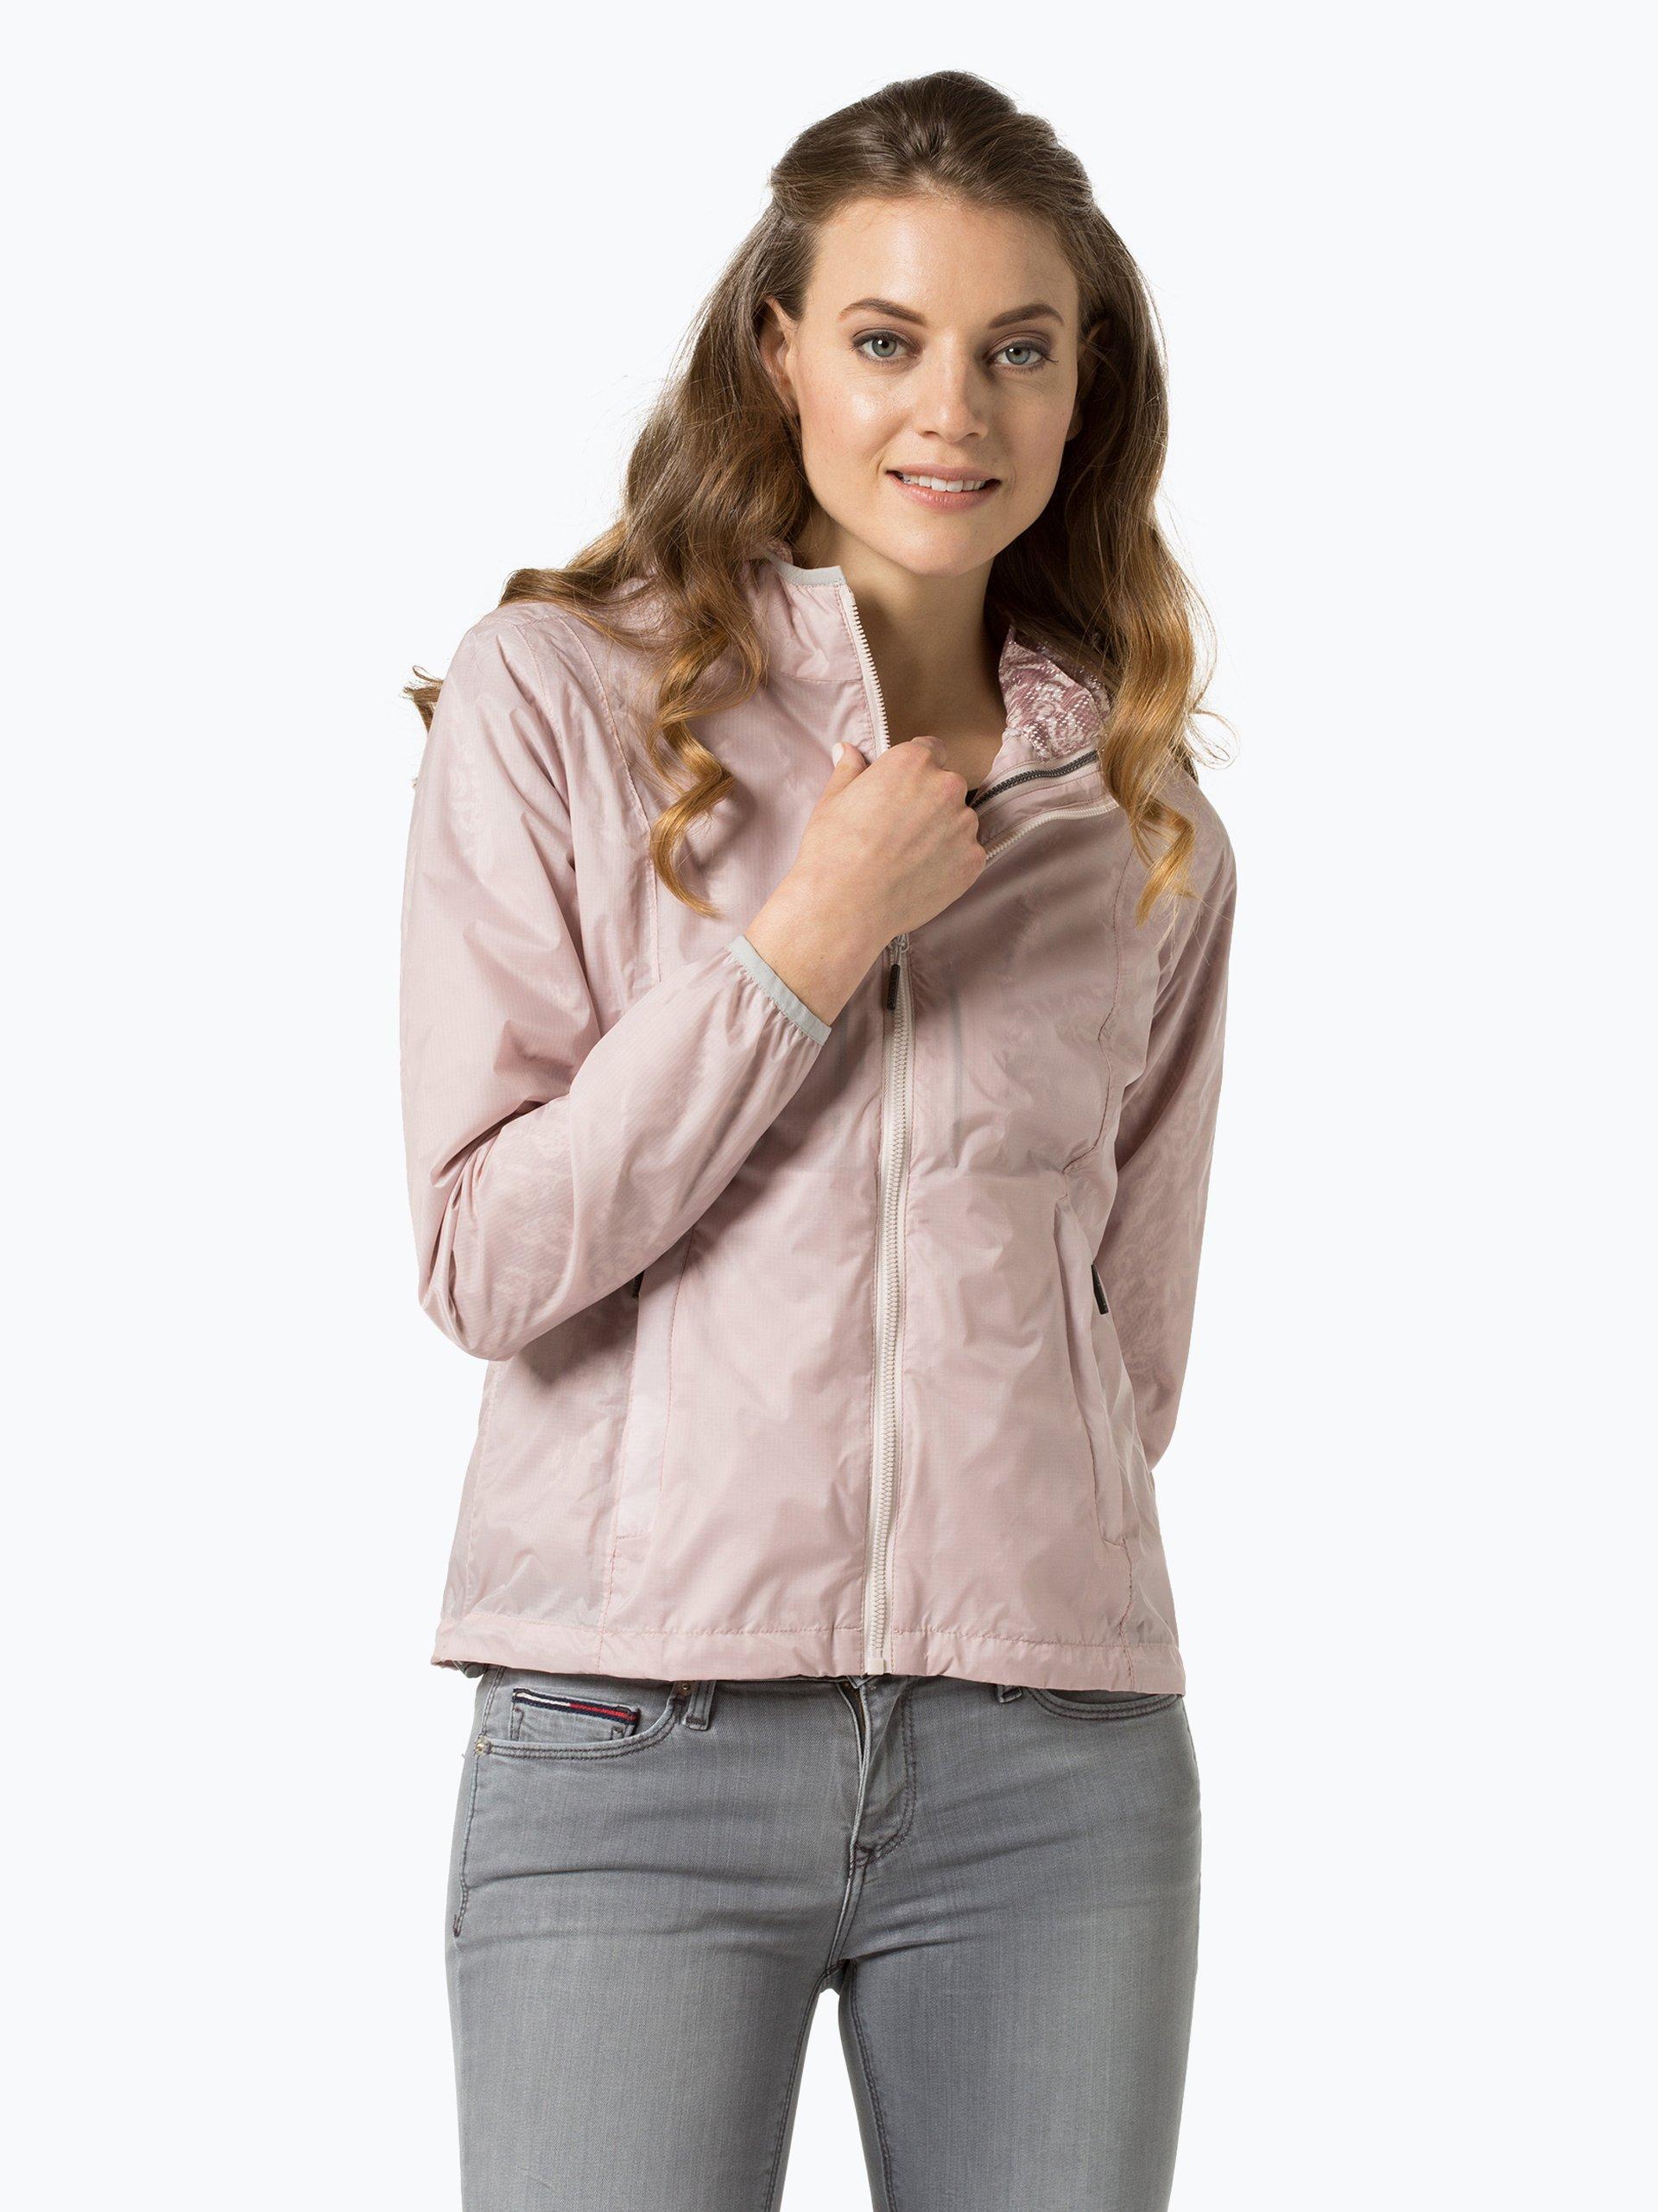 marie lund damen sportswear jacke rosa kariert online kaufen vangraaf com. Black Bedroom Furniture Sets. Home Design Ideas